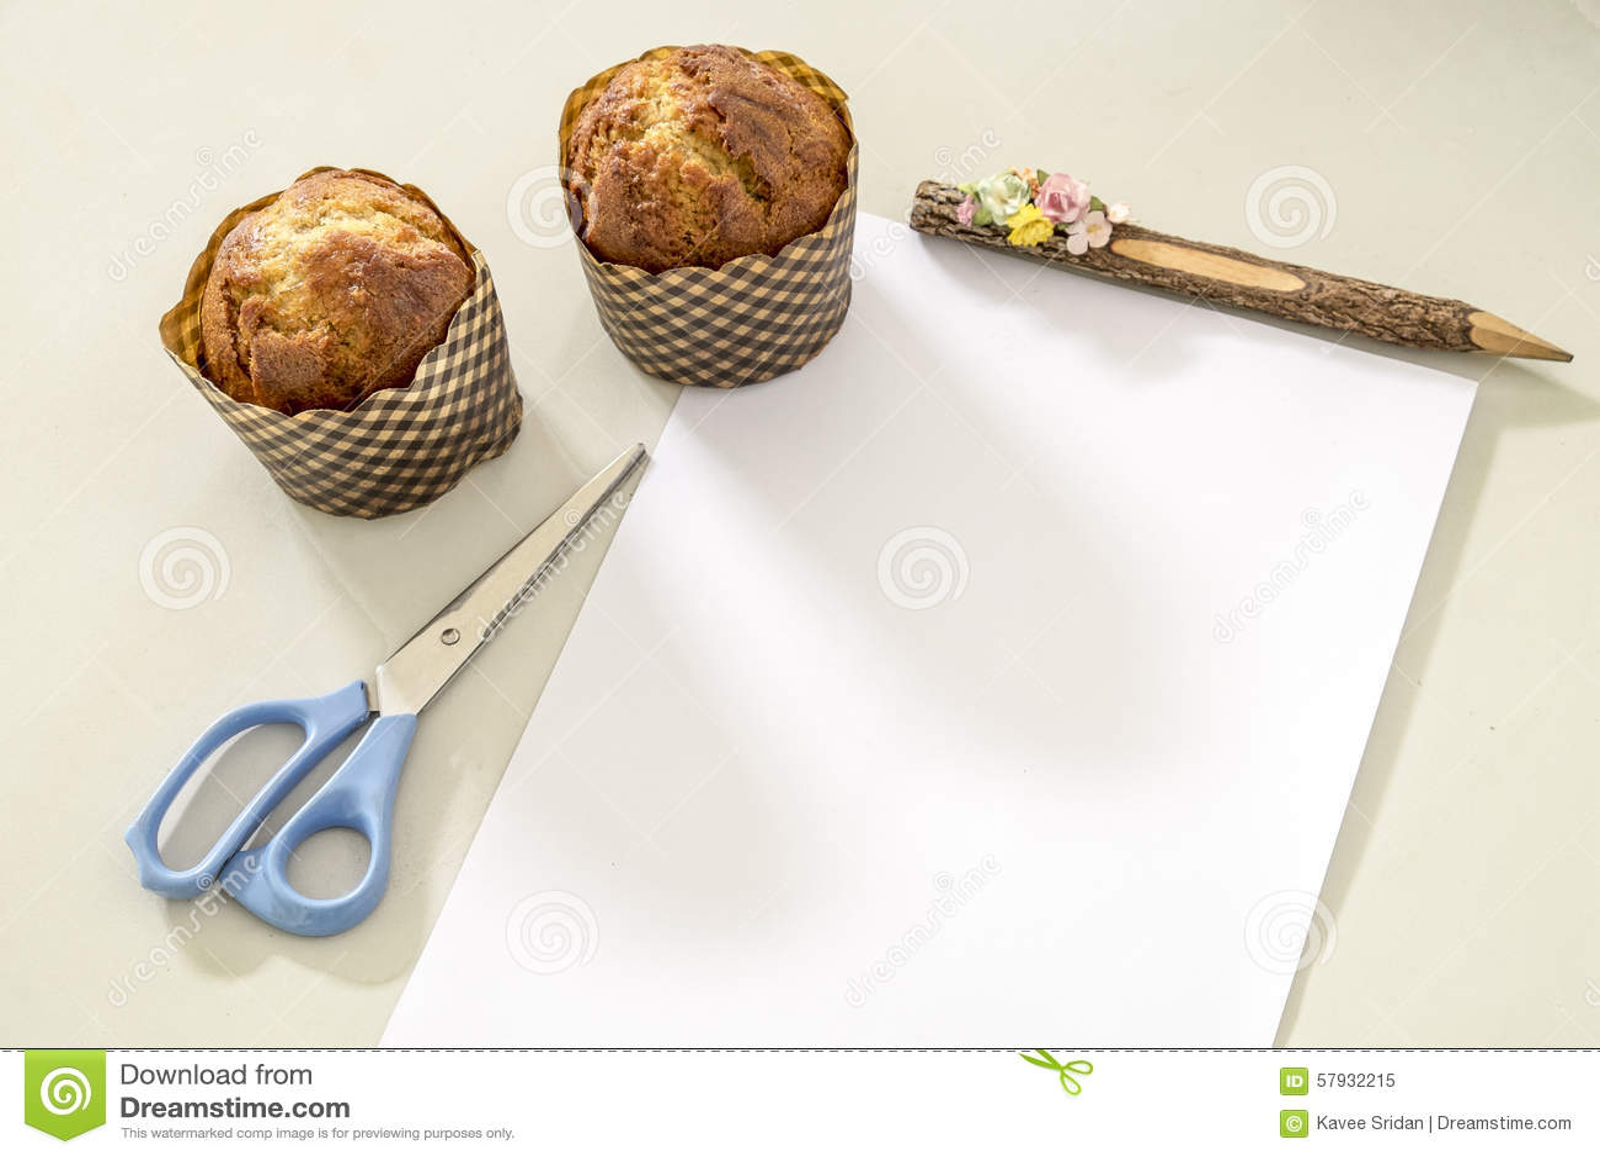 Geschaftsfruhstuckscafe Muffinbananen Schalenkuchen Im Buro